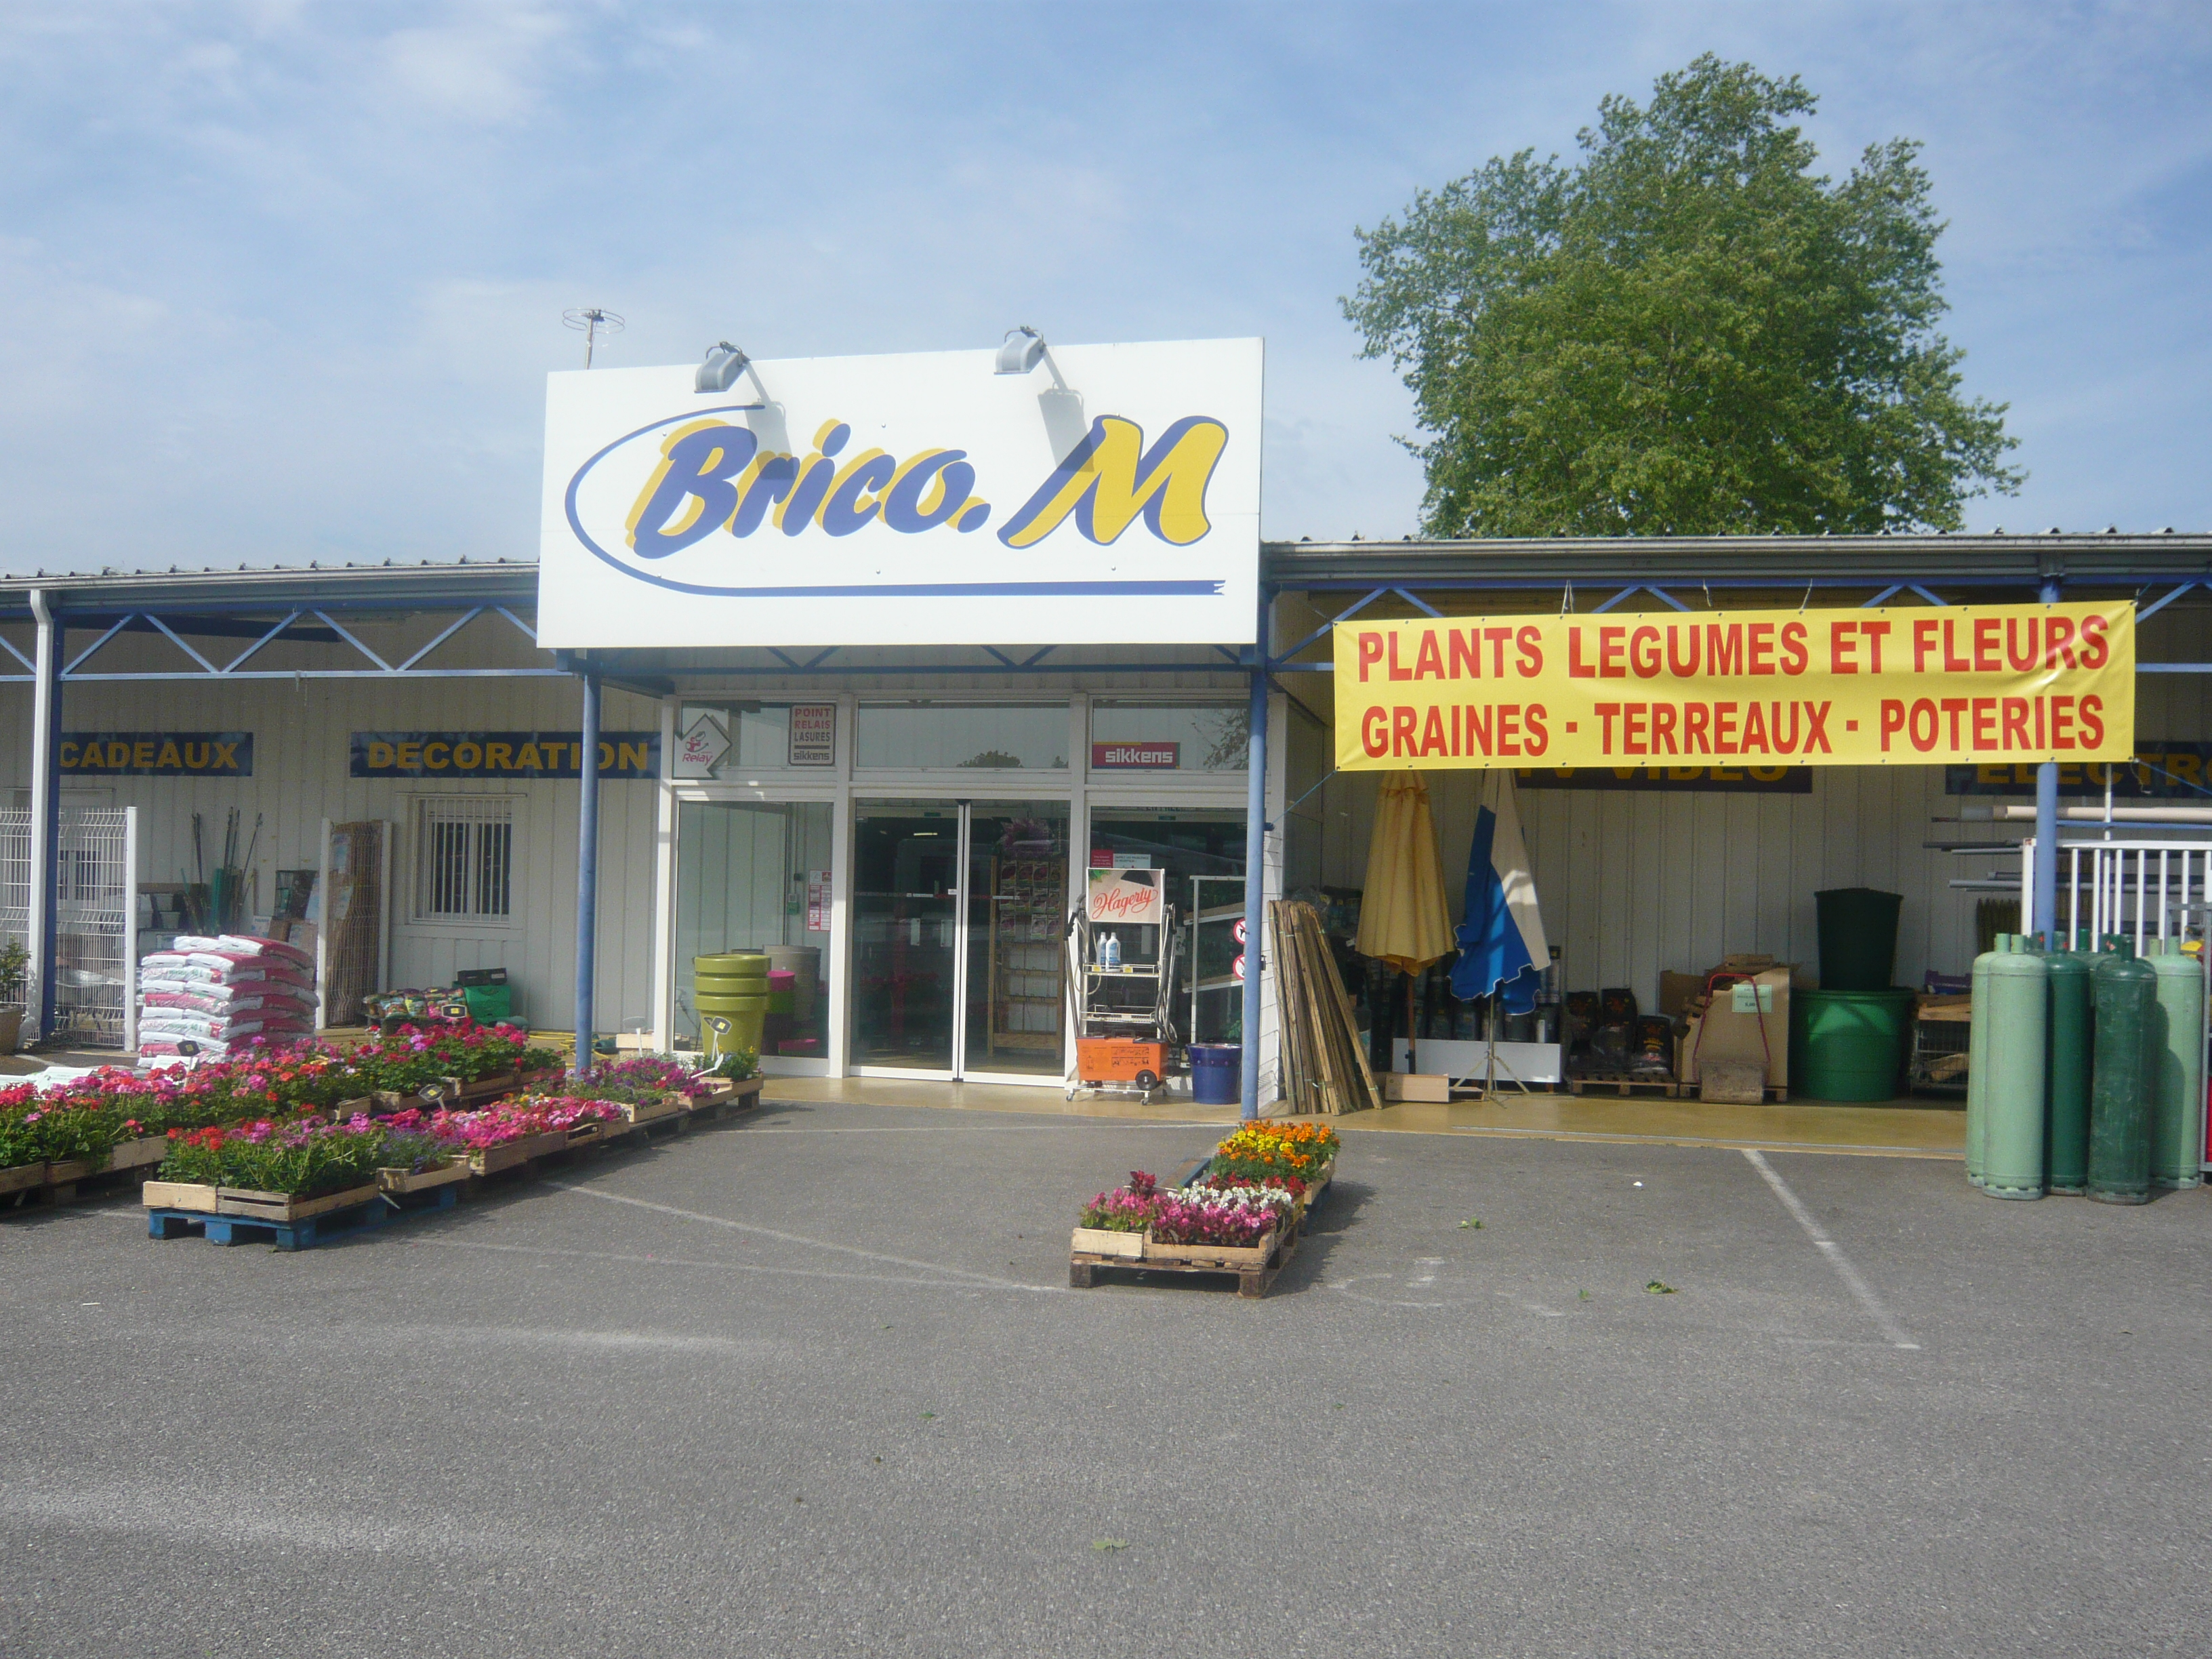 BRICO M